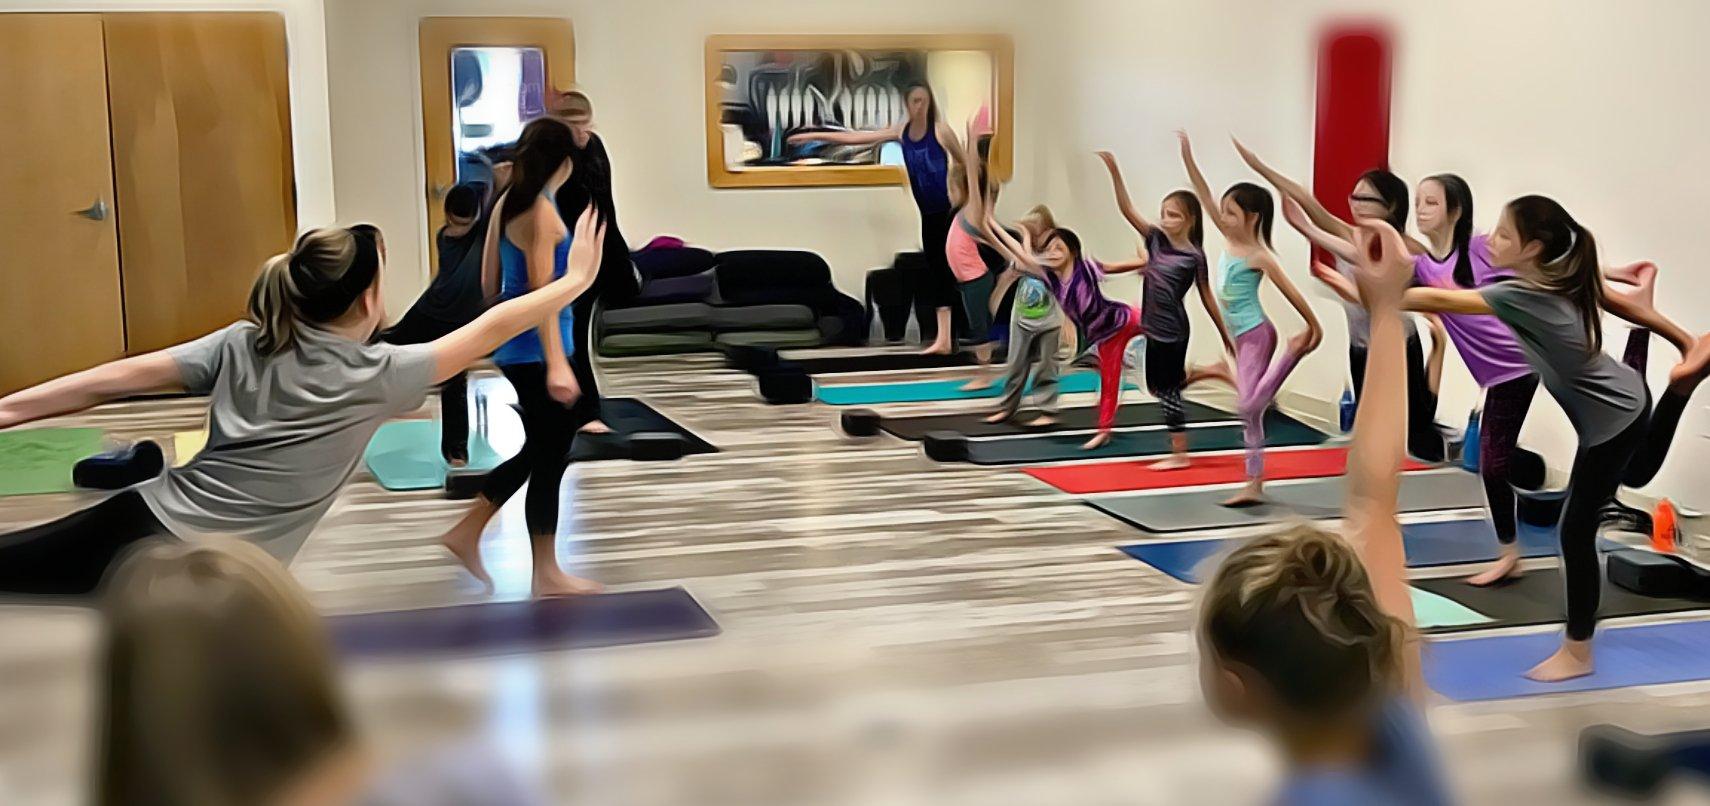 Join us for Kids Yoga! 5 Reasons Kids Need Yoga. - Modern Yoga